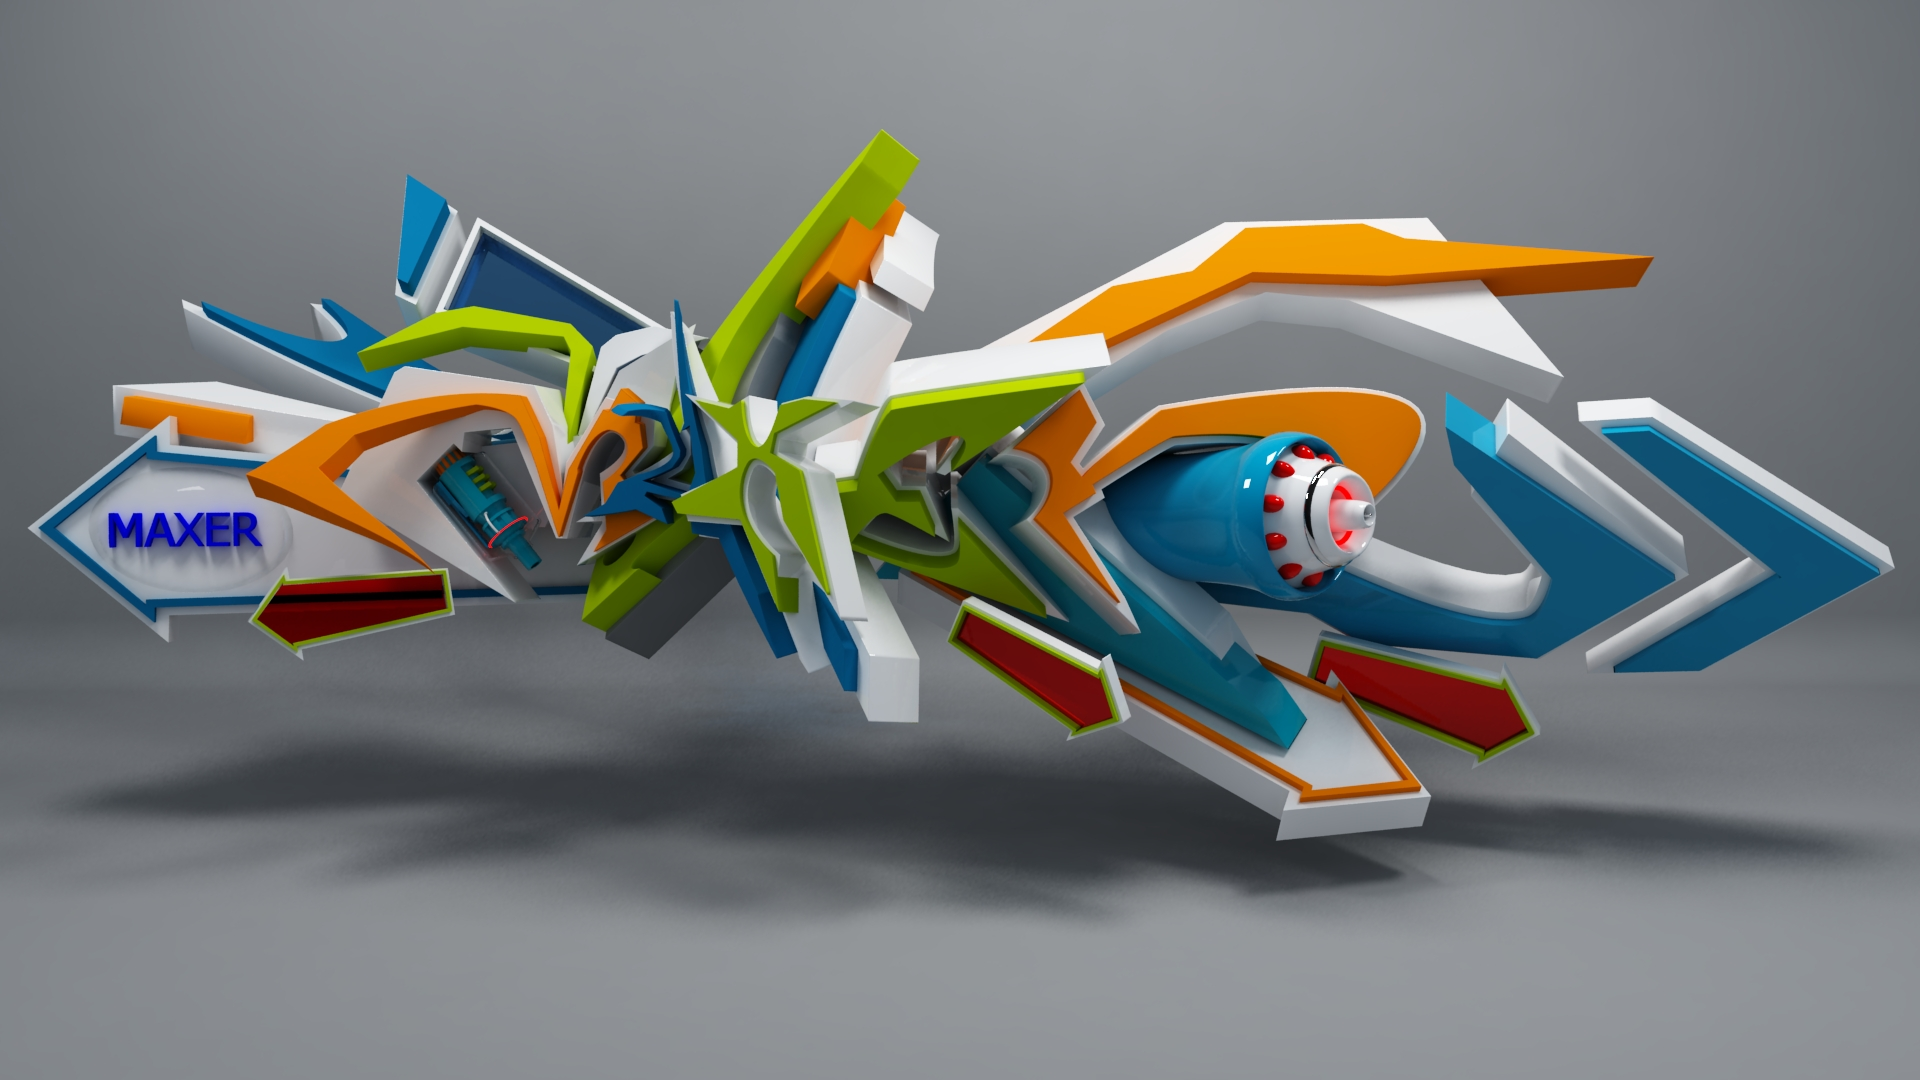 Maxer 3d graffiti by anhpham88 maxer 3d graffiti by anhpham88